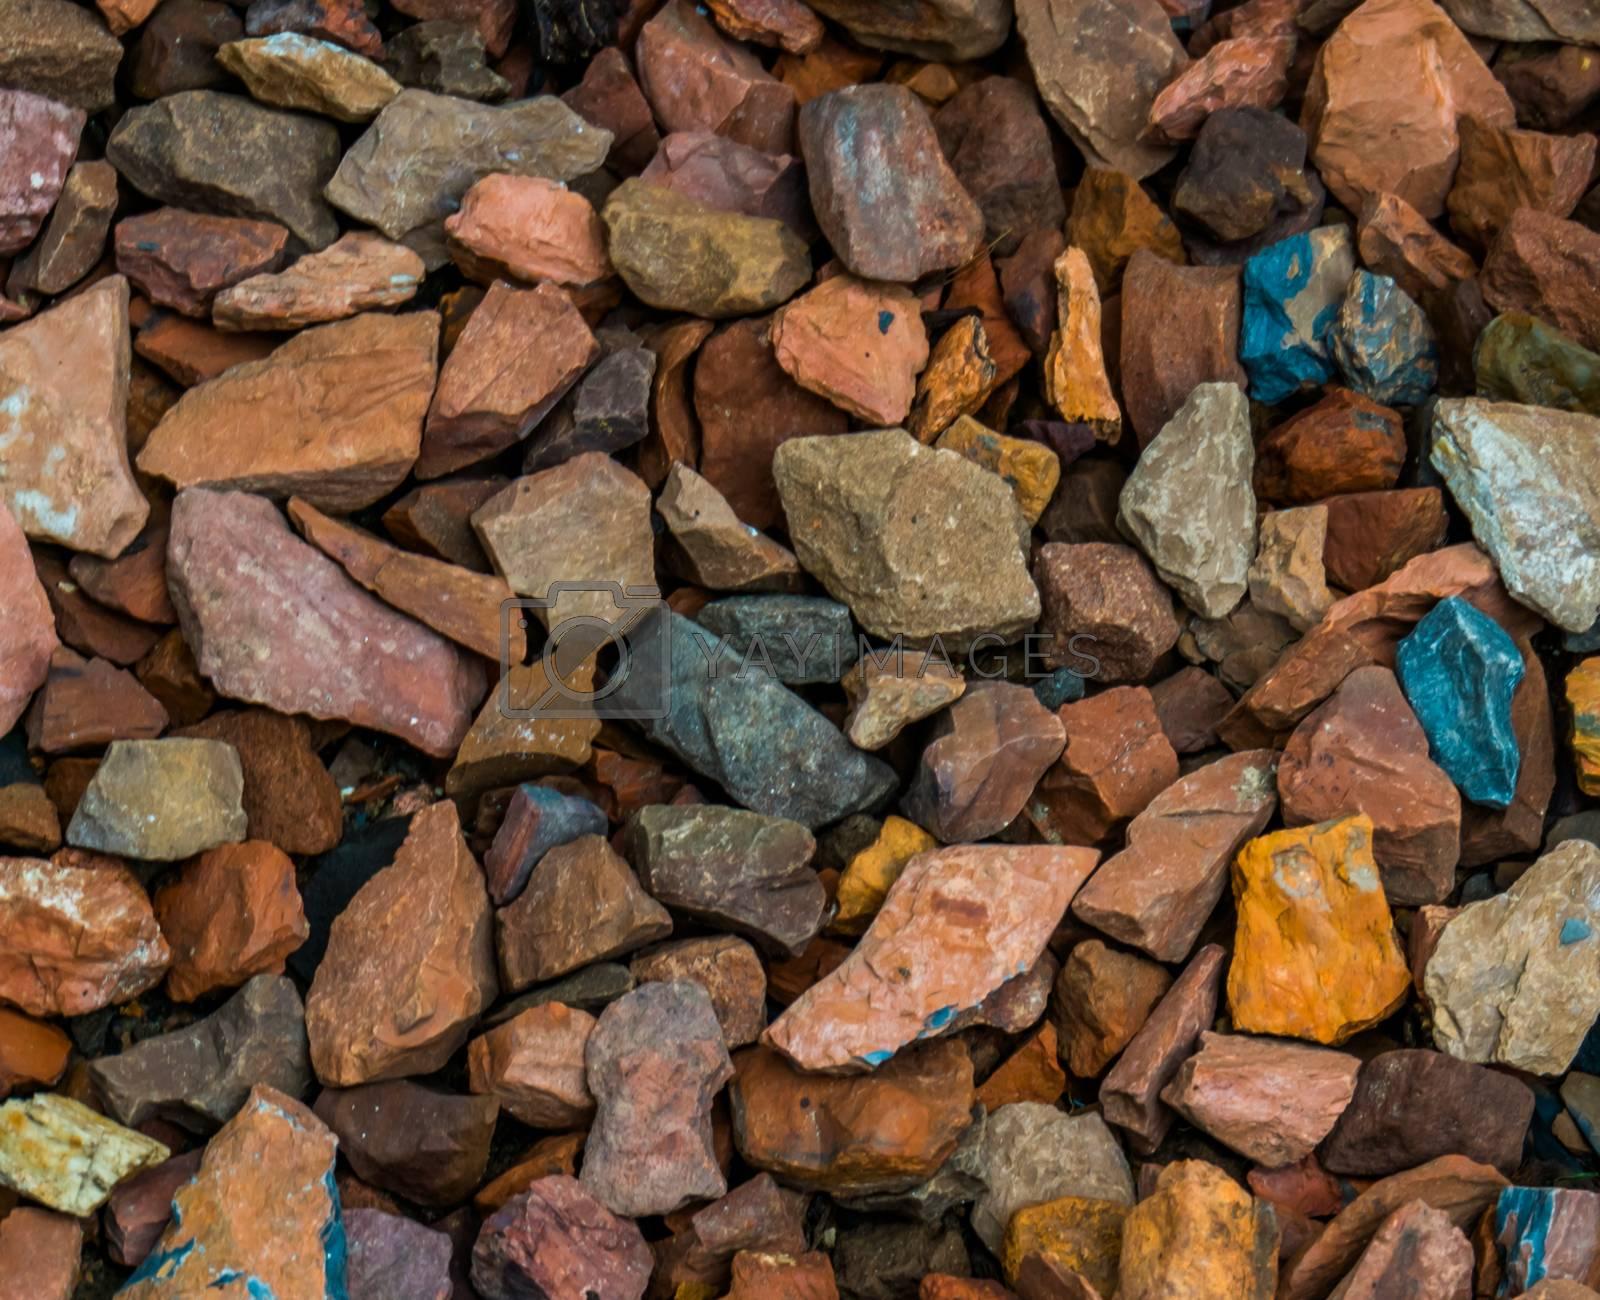 pattern of small gravel rocks, garden decorations for walking paths, rock pattern background by charlotte Bleijenberg